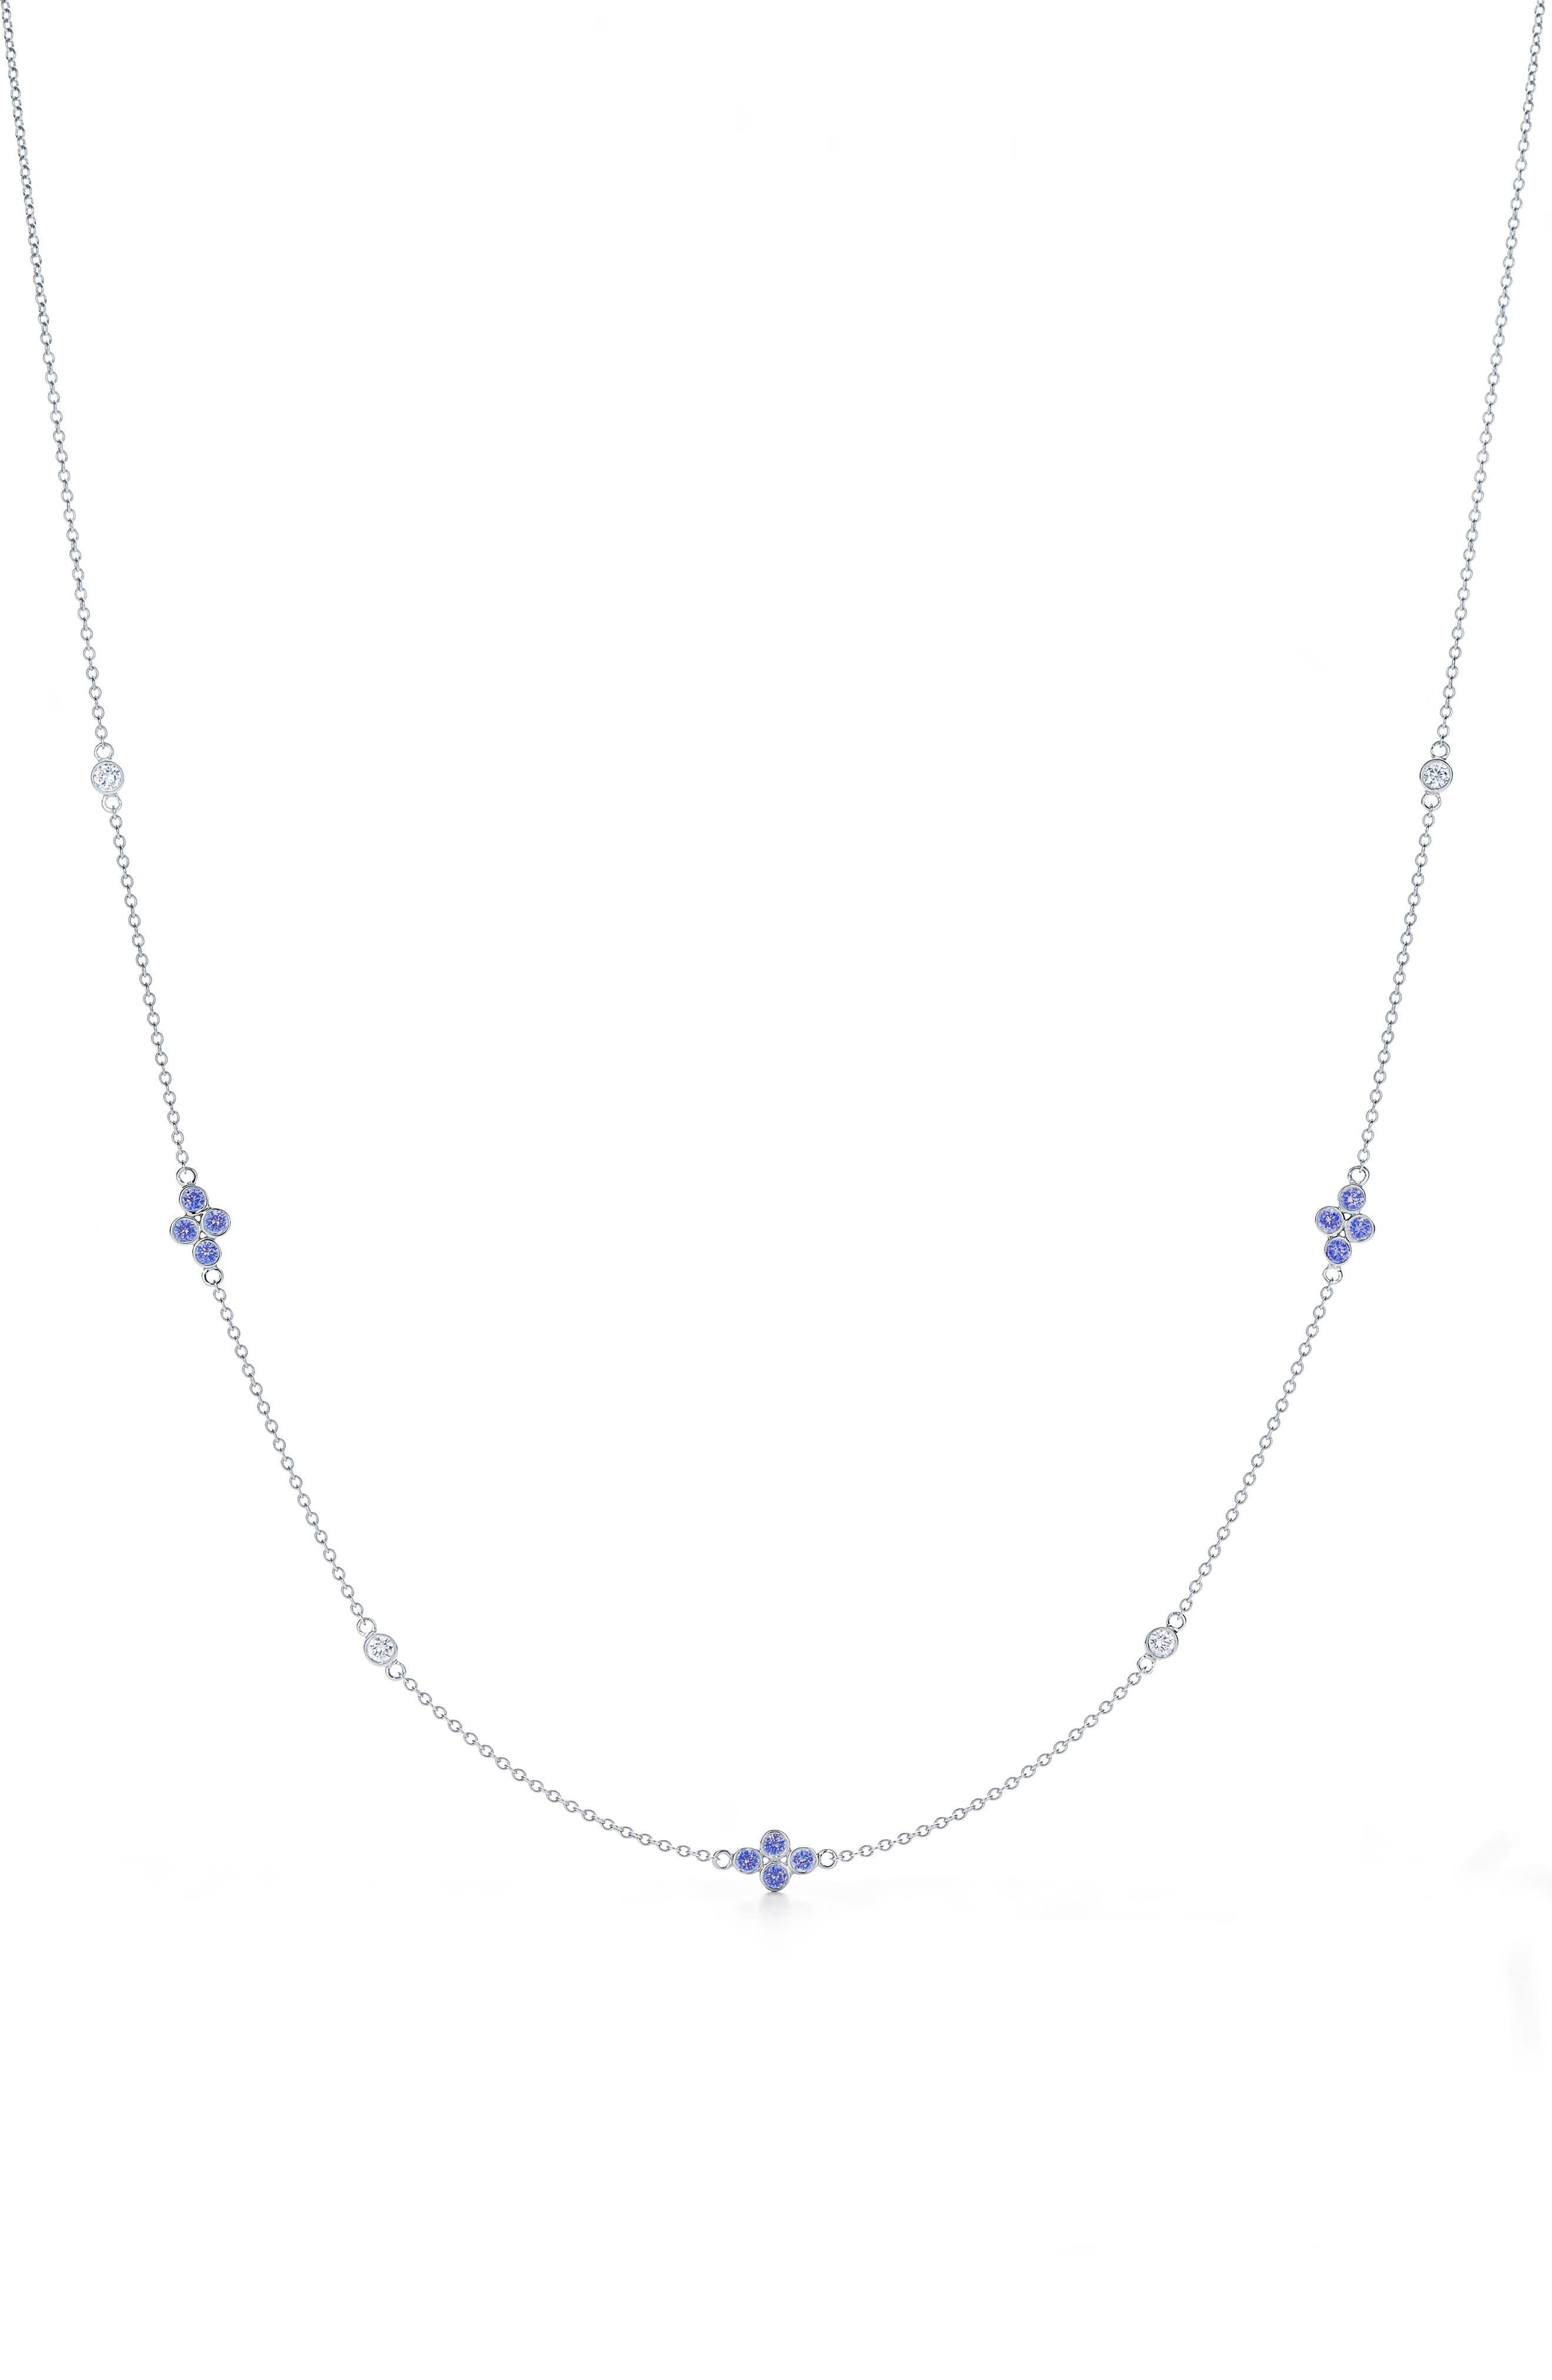 Diamond Strings Diamond & Sapphire Station Necklace,                             Main thumbnail 1, color,                             WHITE GOLD